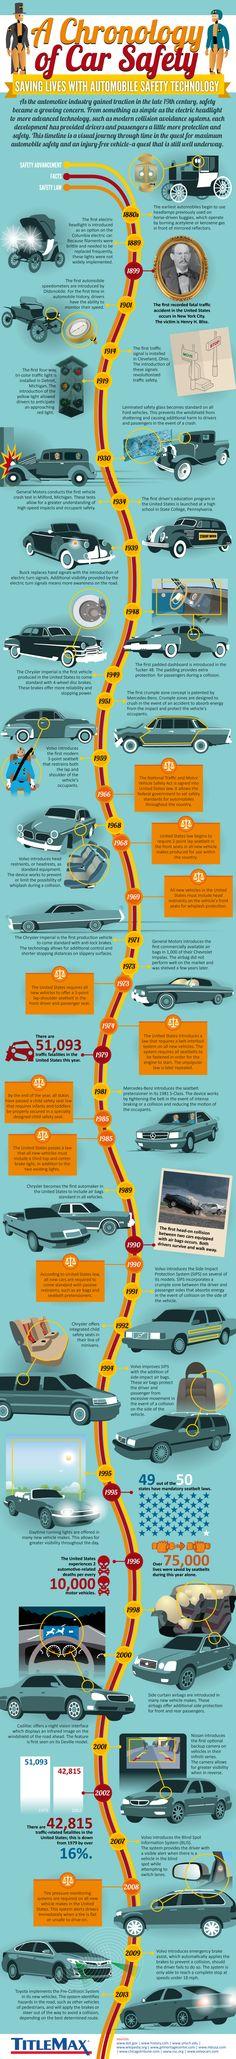 The future of cars. Car safety #NoCrashCars #autonomousvehicles #selfdrivingcar  #moderntech